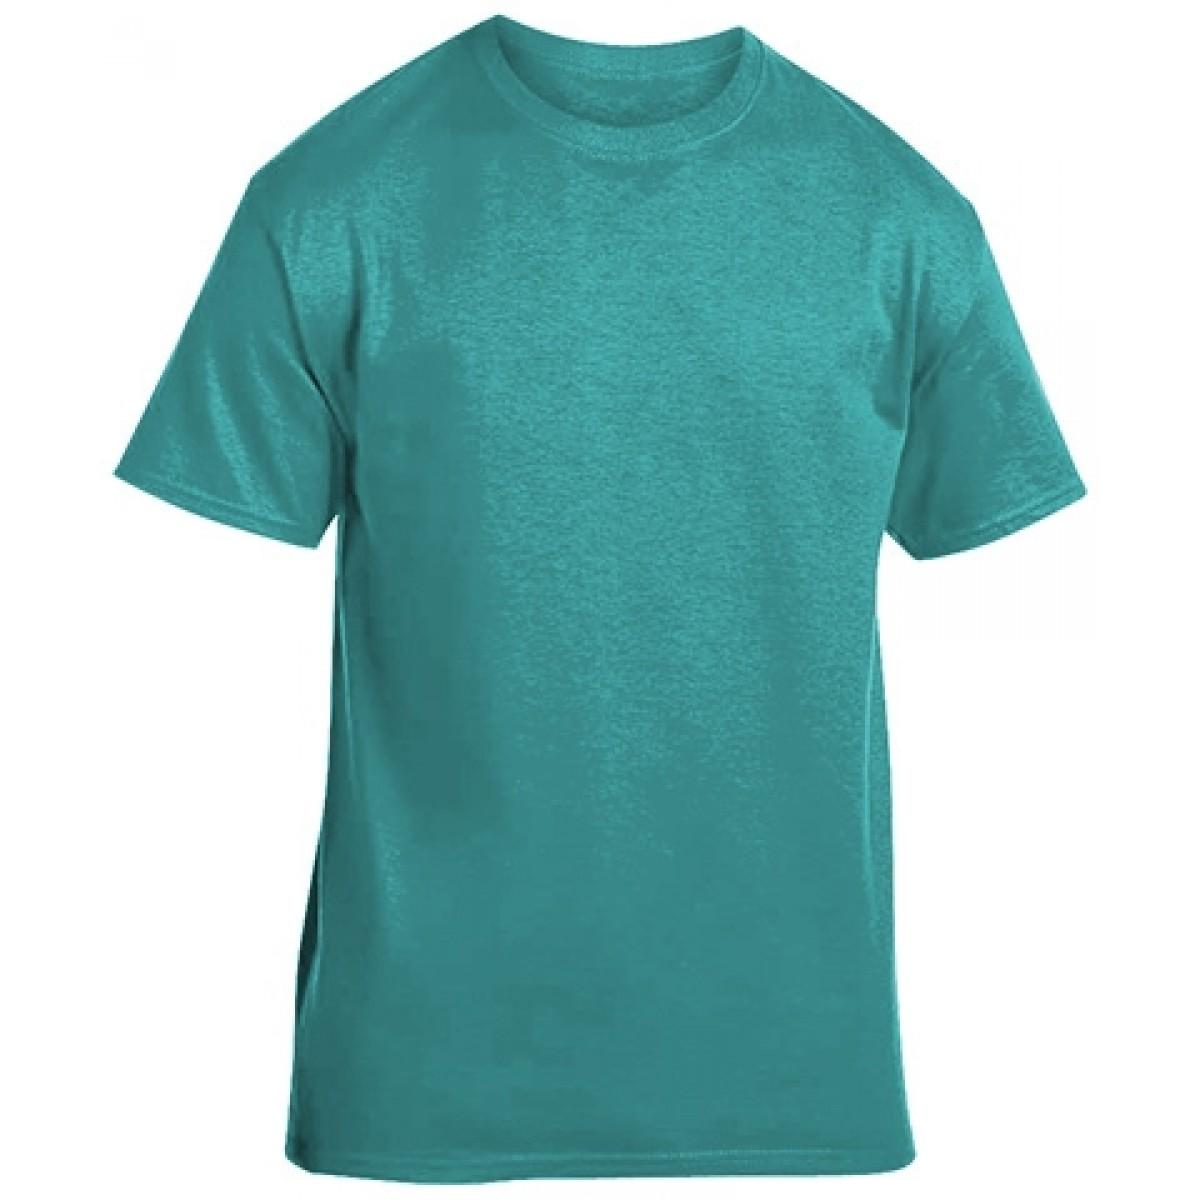 Soft 100% Cotton T-Shirt-Jade-YS